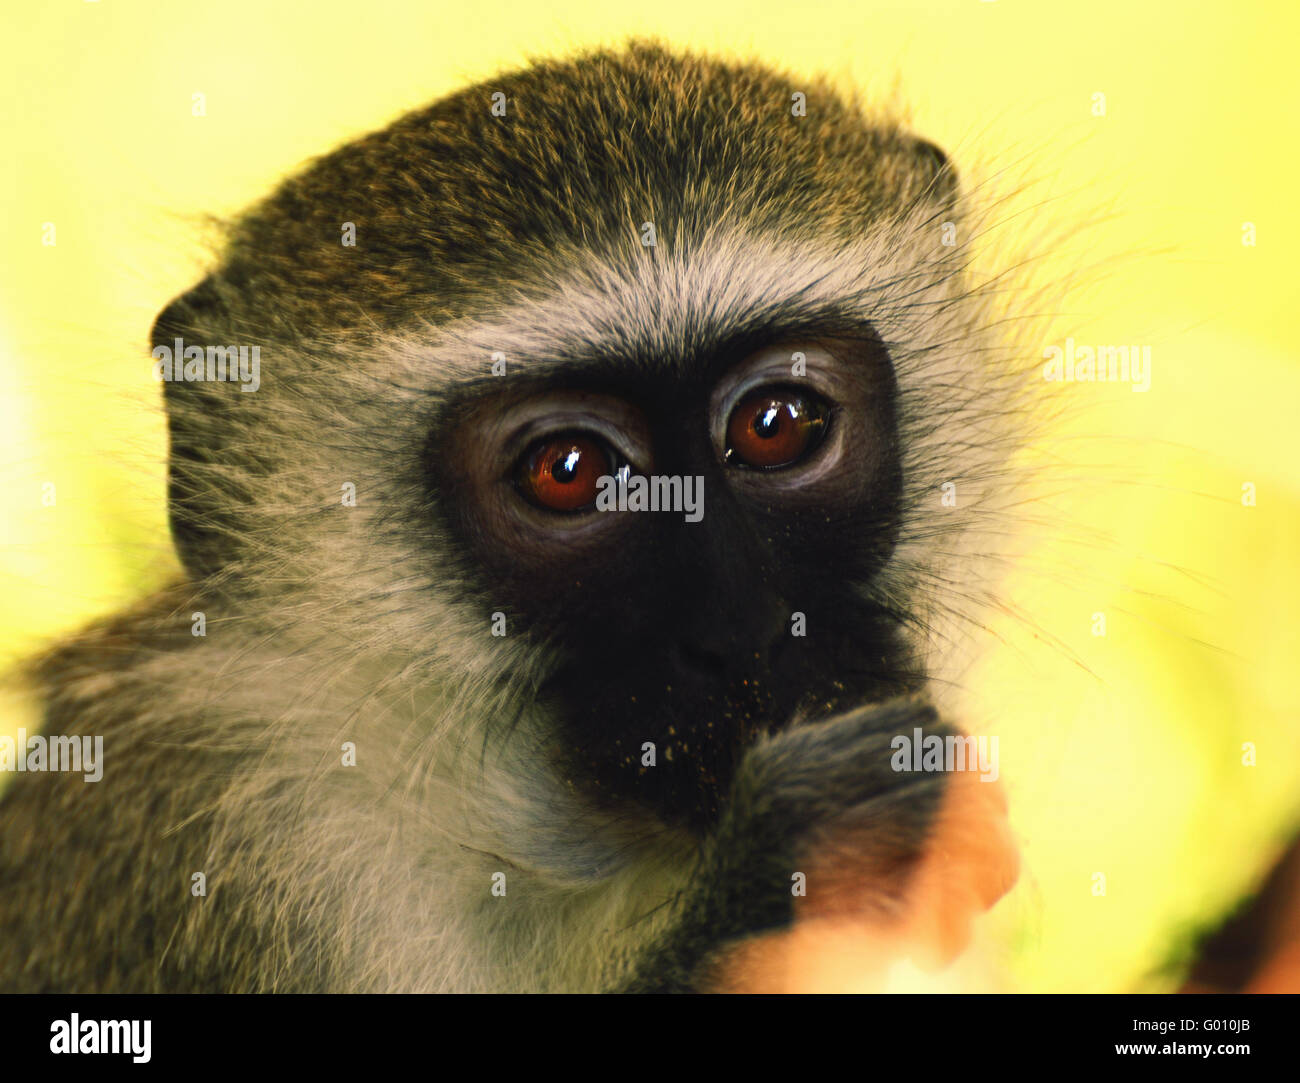 Dreaming Monkey - Stock Image